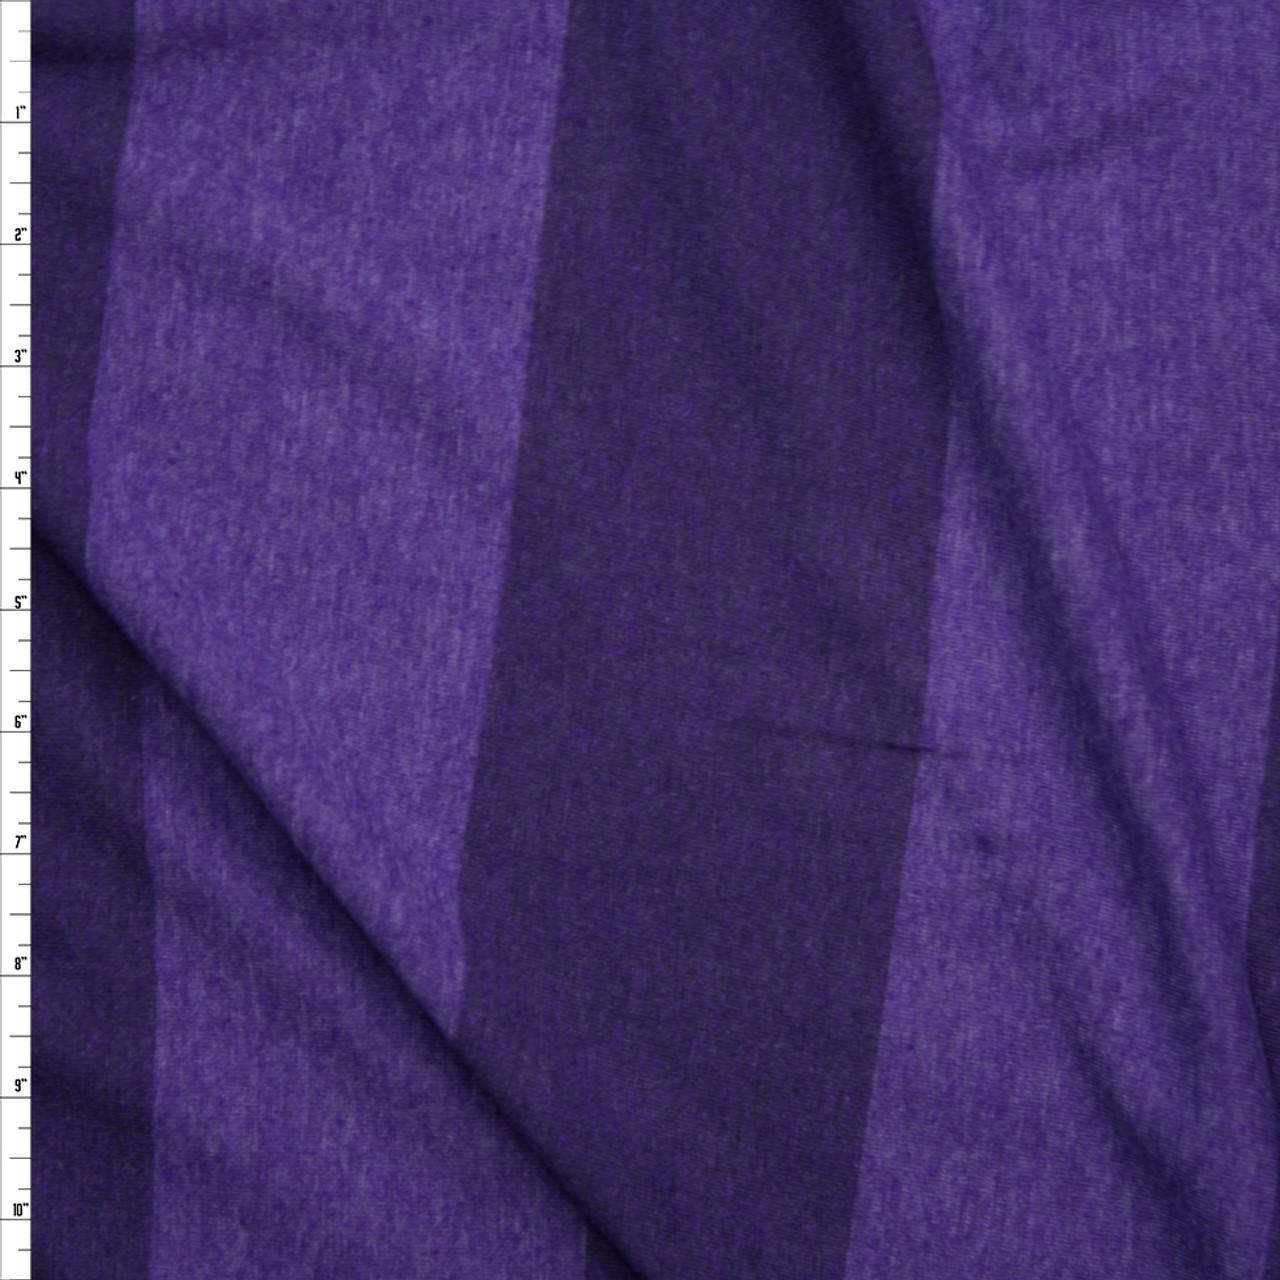 efc0455a9f5 Cali Fabrics Purple Wide Stripe Lightweight Jersey Knit Fabric by ...